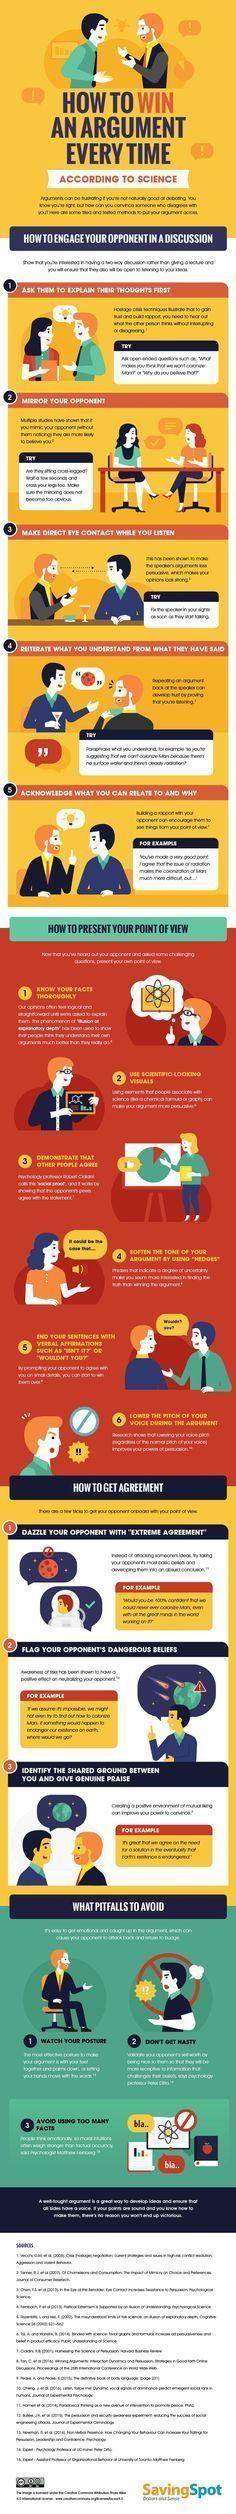 Assertiveness techniques Infographic